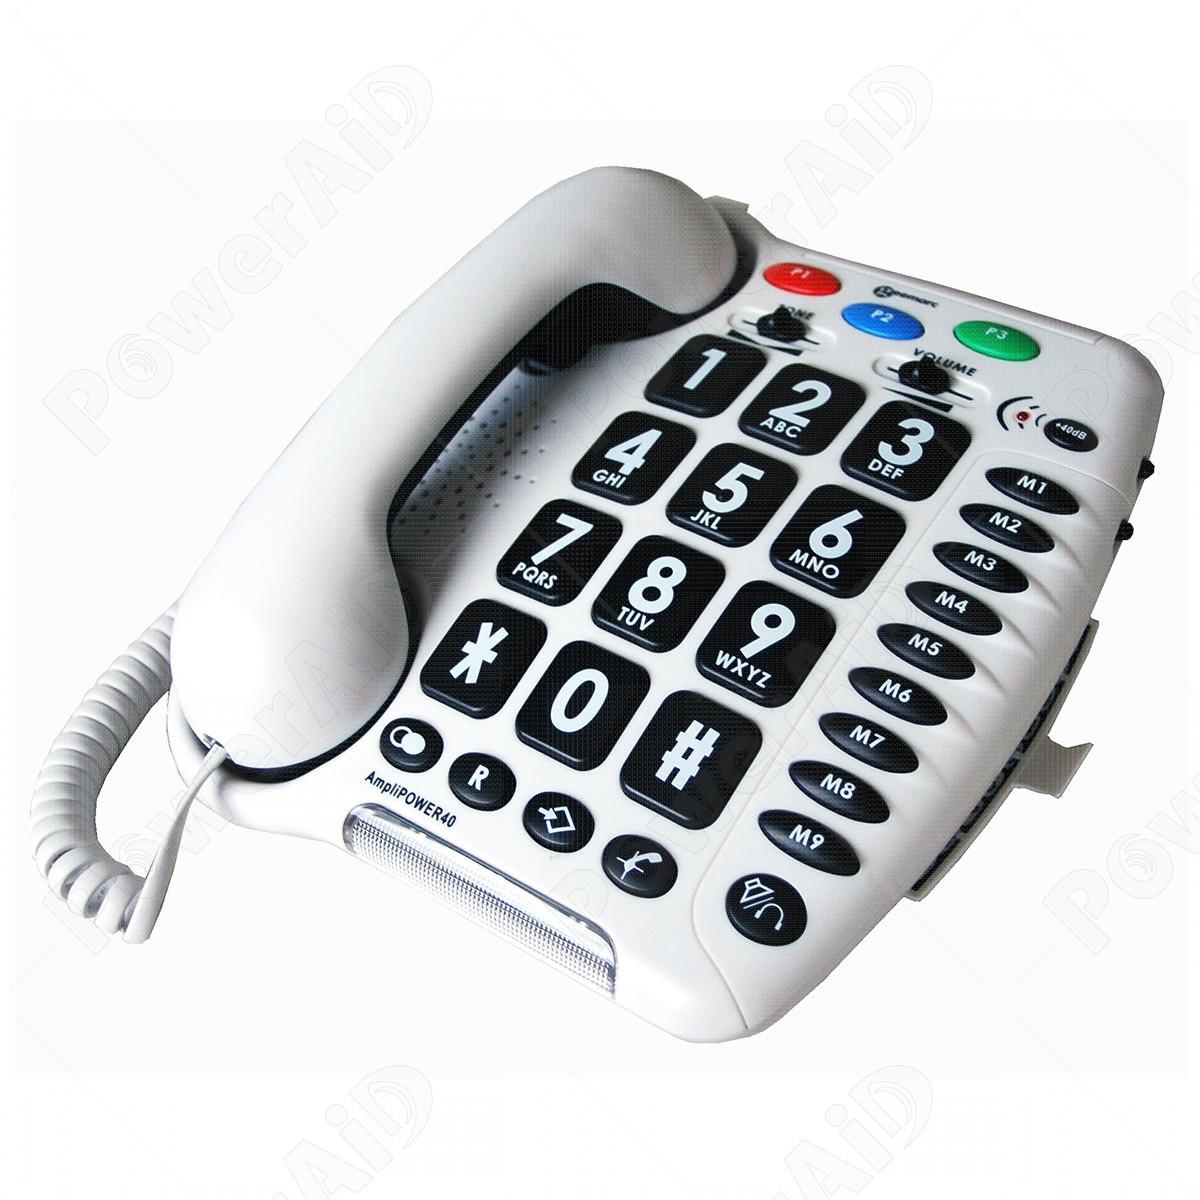 Geemarc - AmpliPOWER 40 Bianco telefono amplificato - Telefoni Fissi ... f009d15256e9